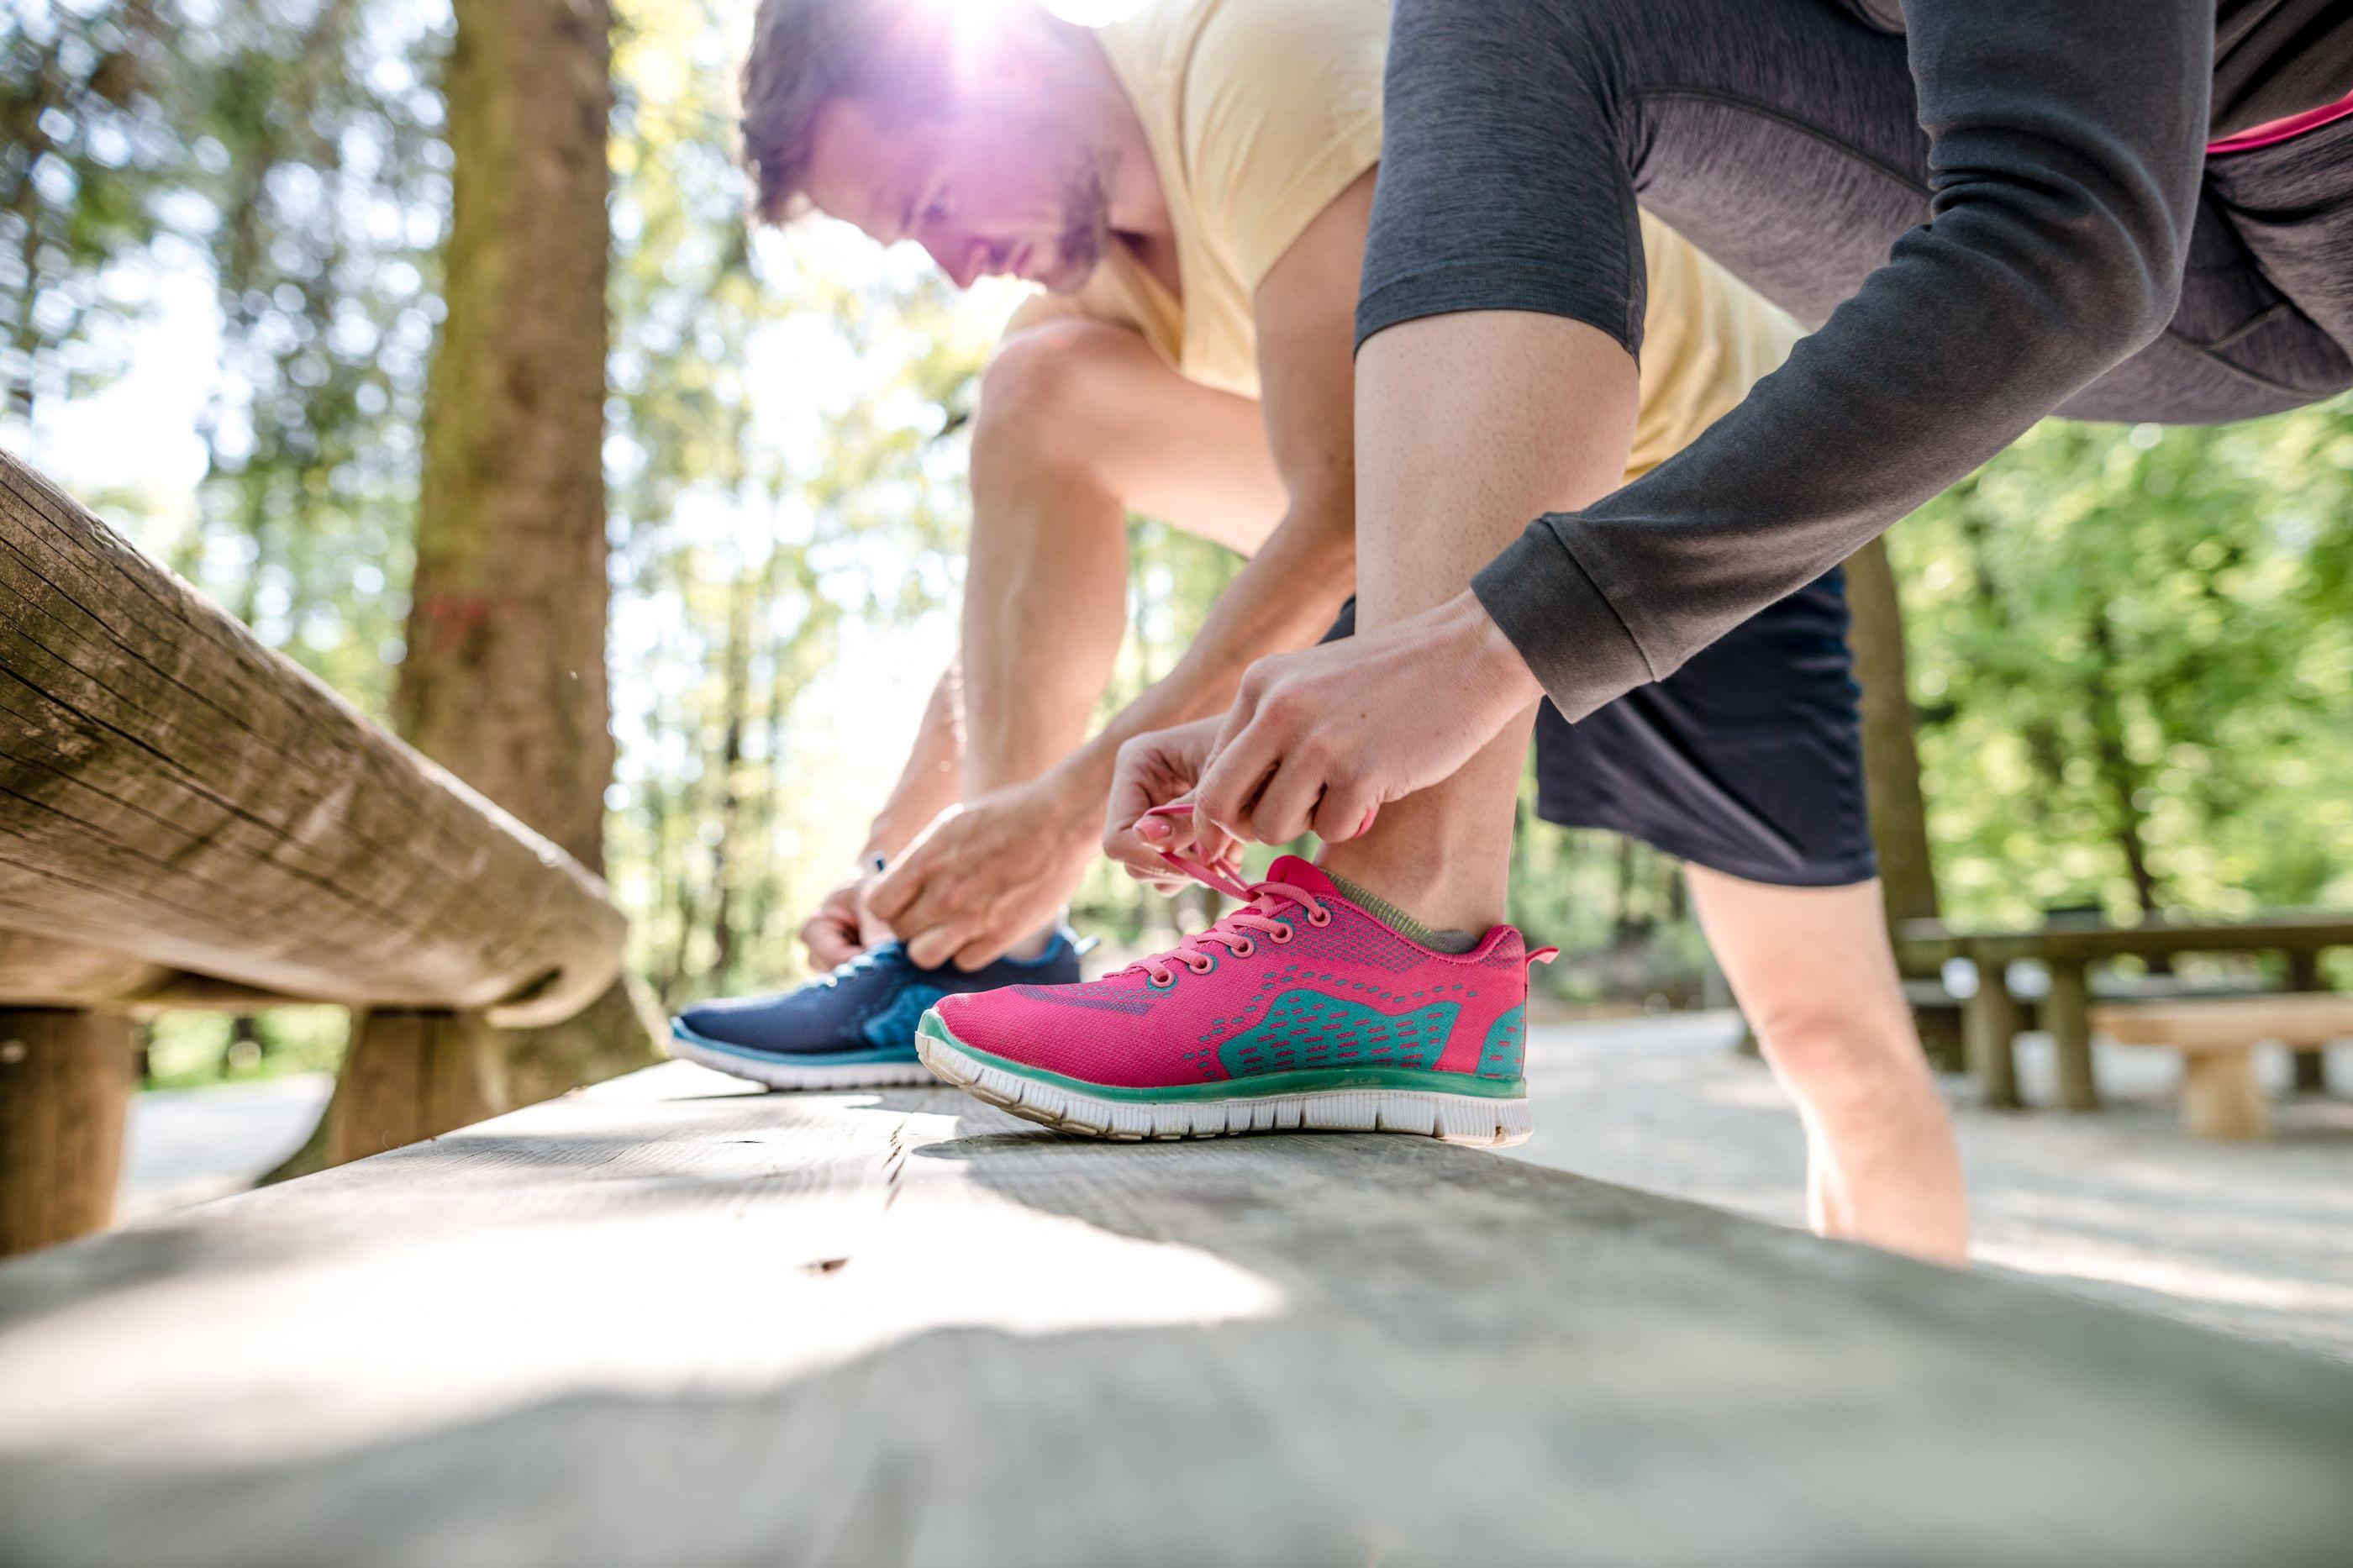 Tudo o que precisa de saber sobre sapatilhas de corrida